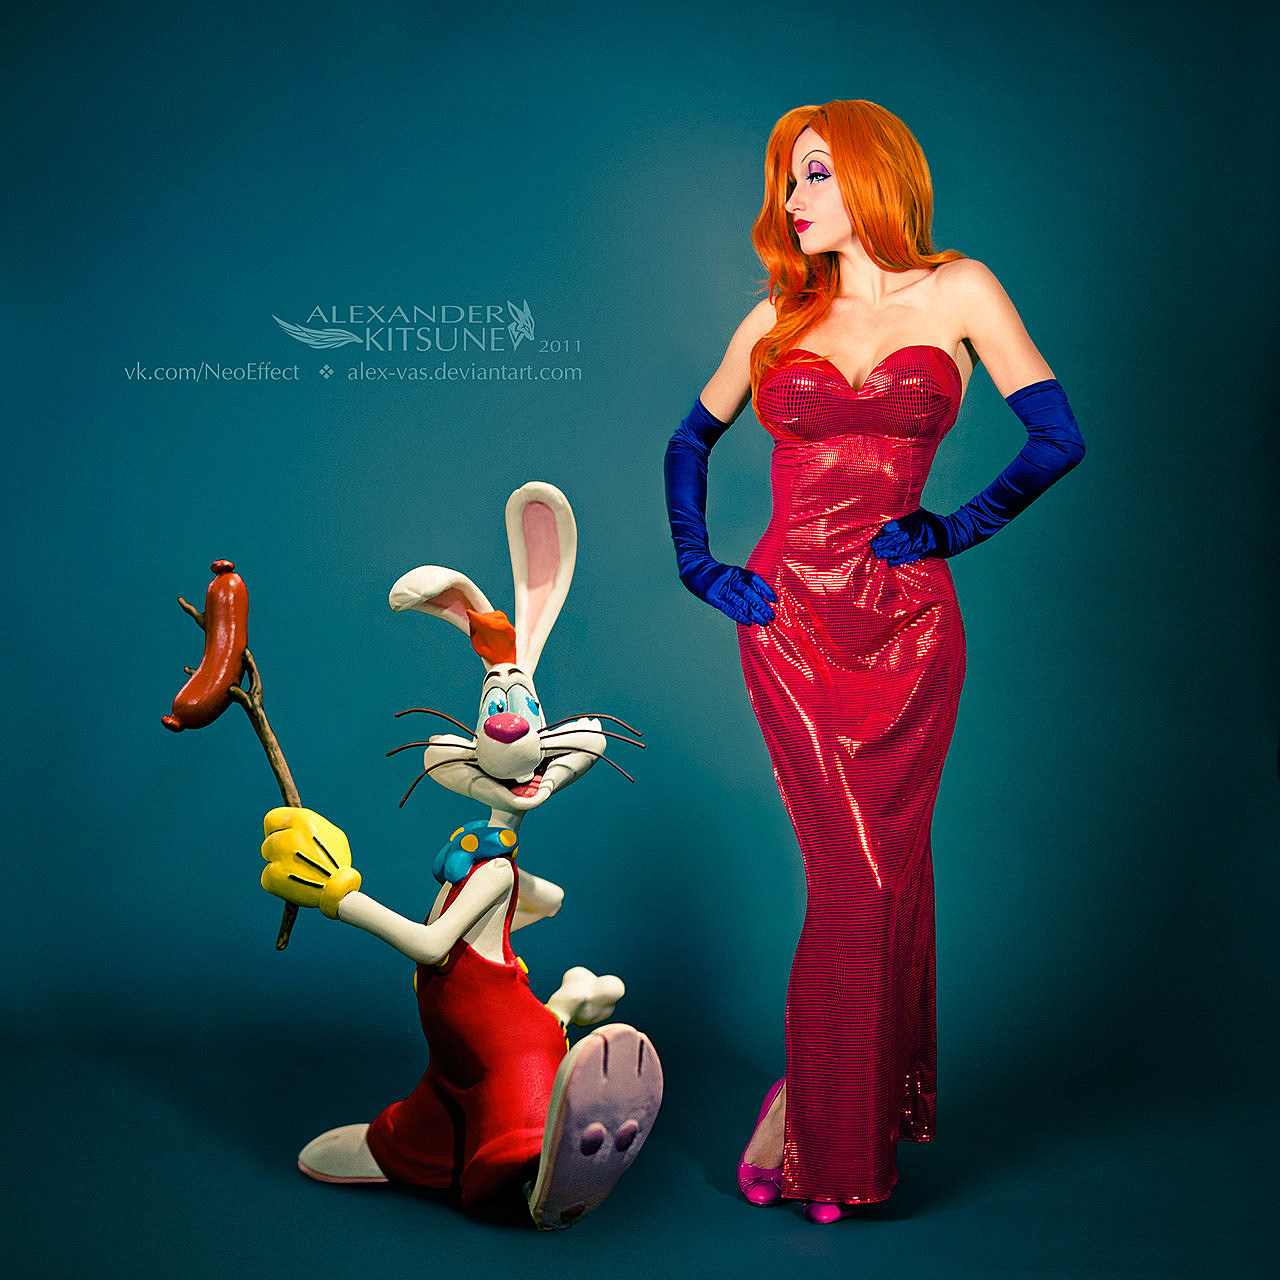 roger rabbit framed cosplay Who